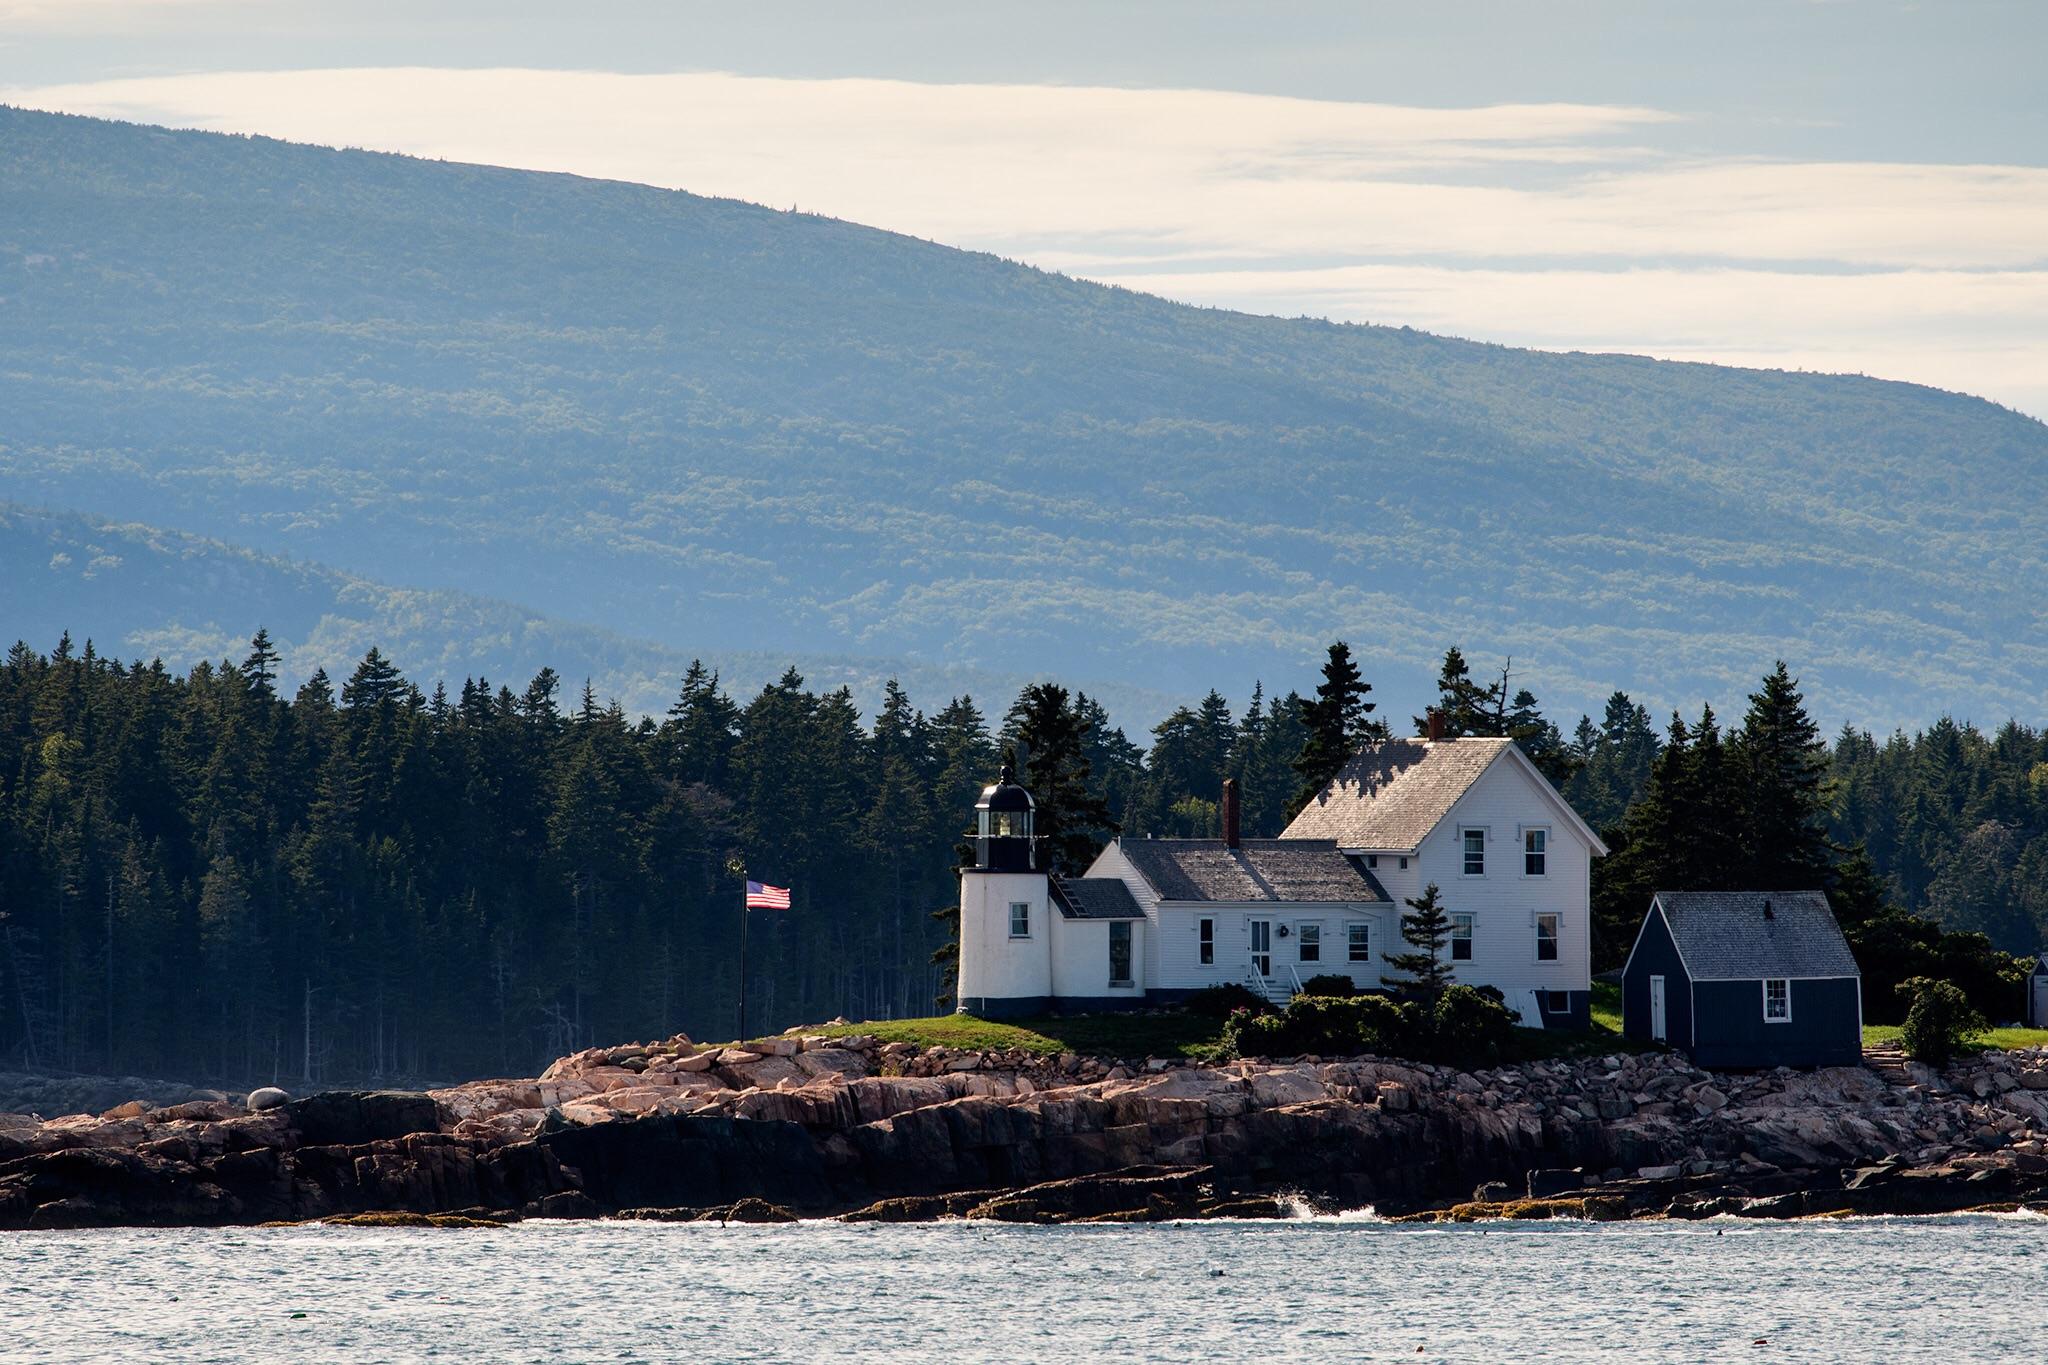 The Winter Harbor Lighthouse on Mark Island